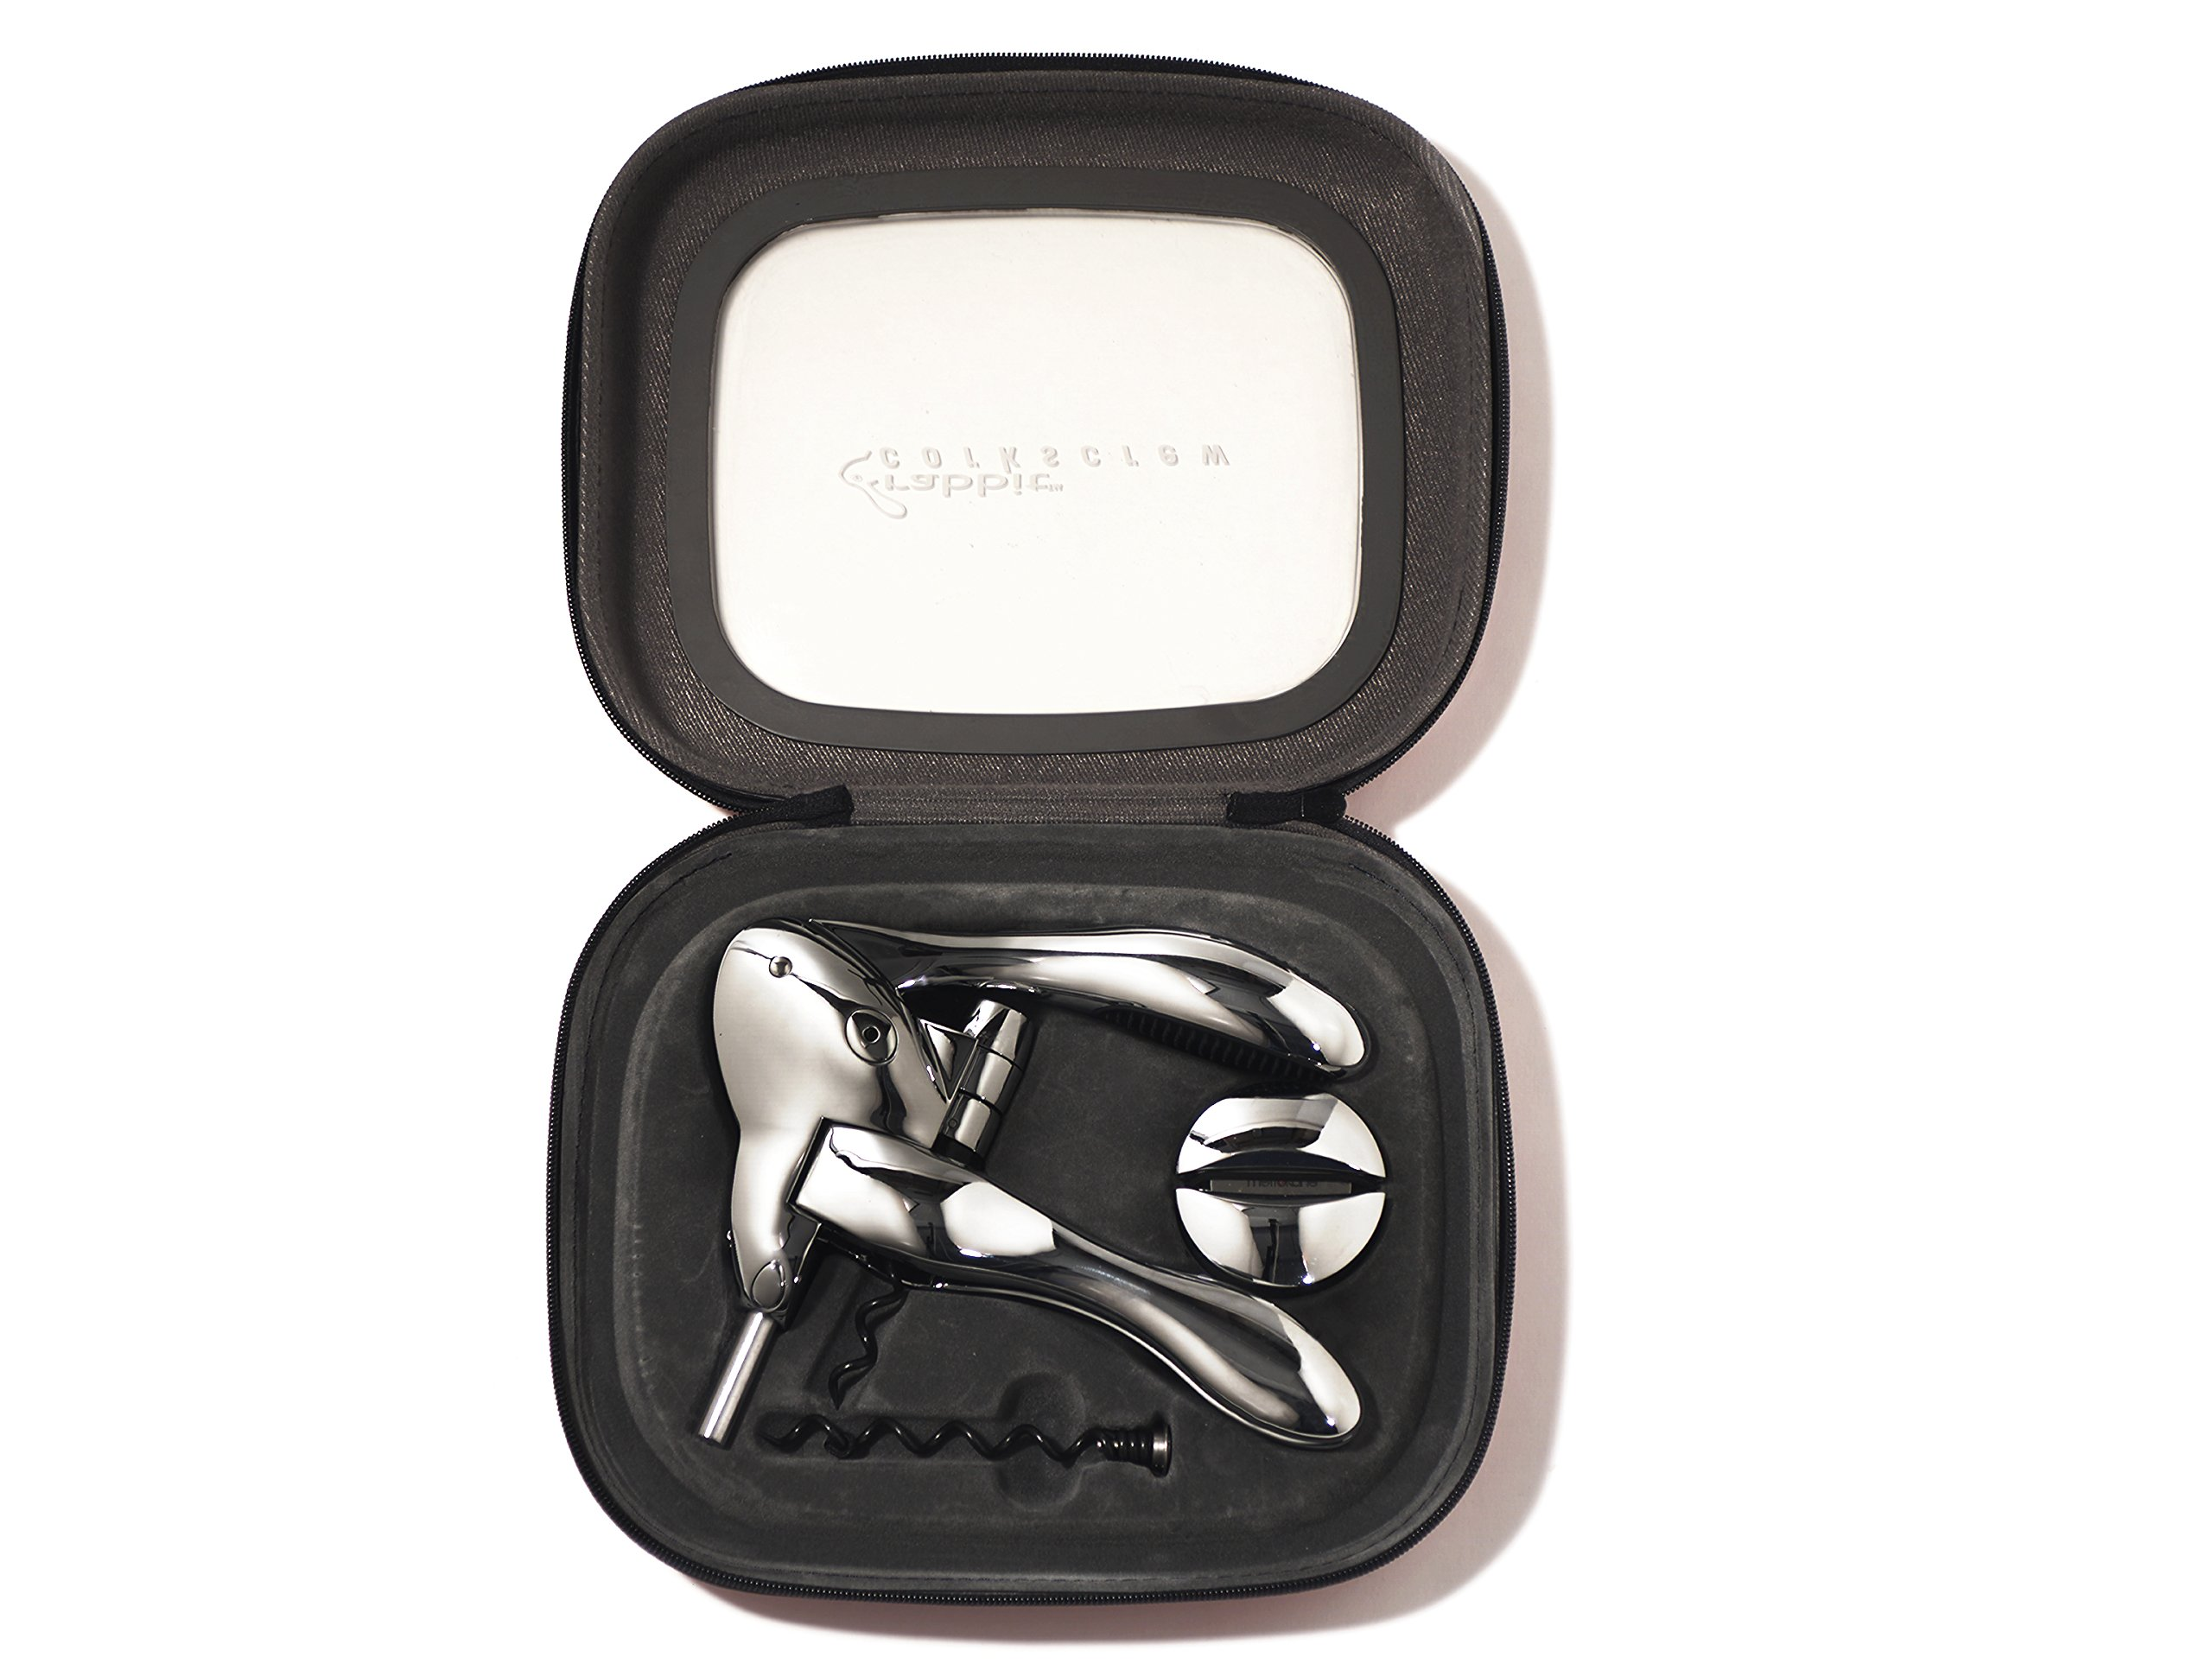 Rabbit Zippity Polished Sterling Corkscrew in EVA Storage Case (Black) by Rabbit (Image #2)